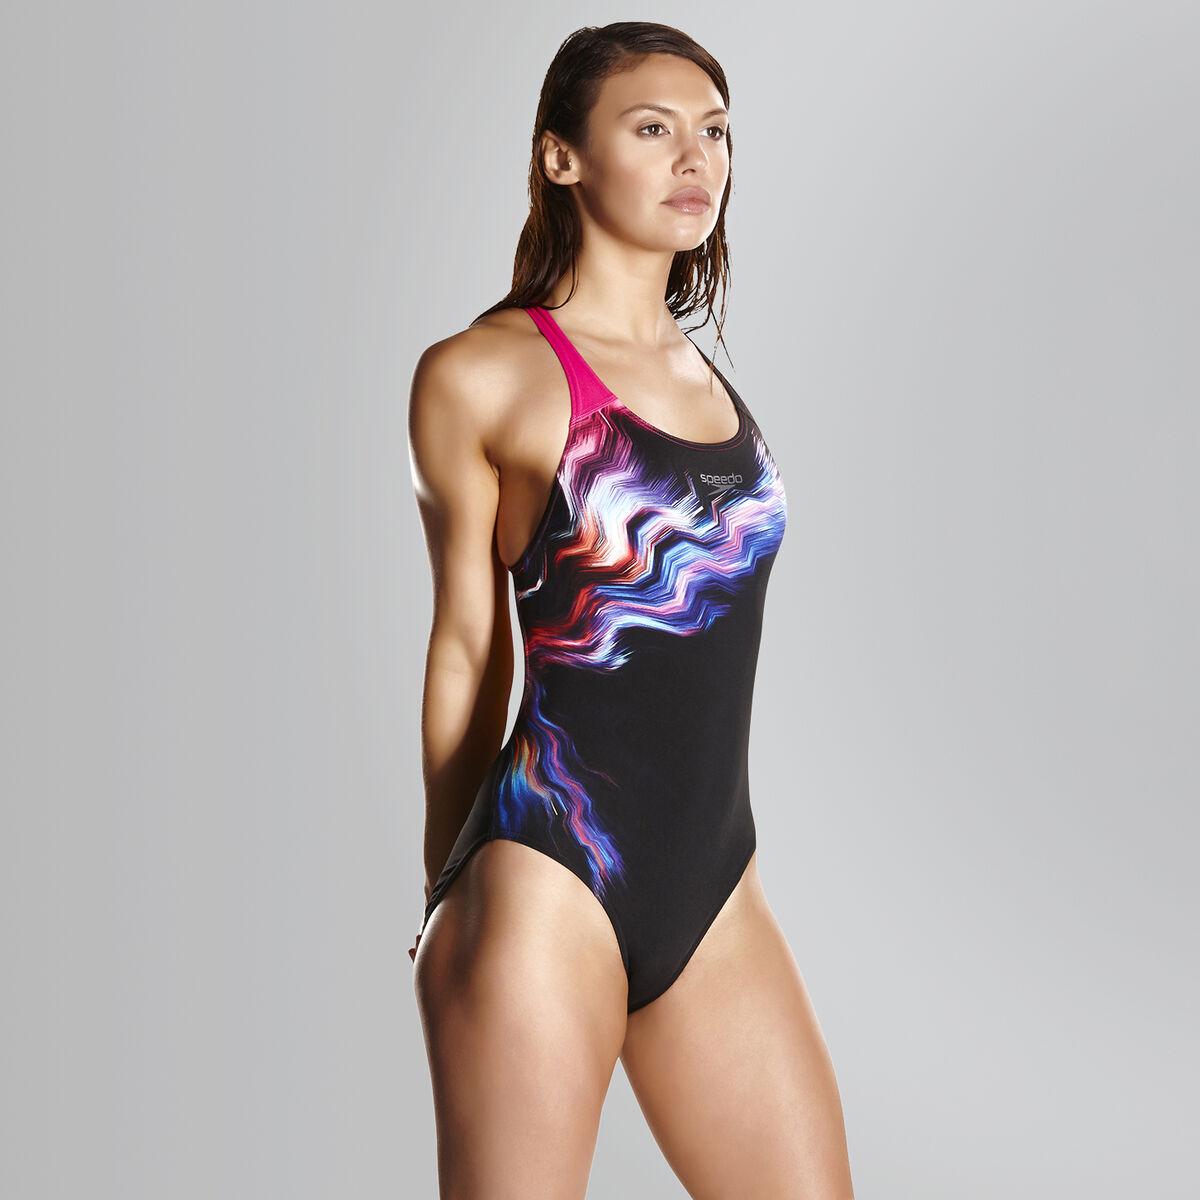 Lunar Vision Powerback Swimsuit